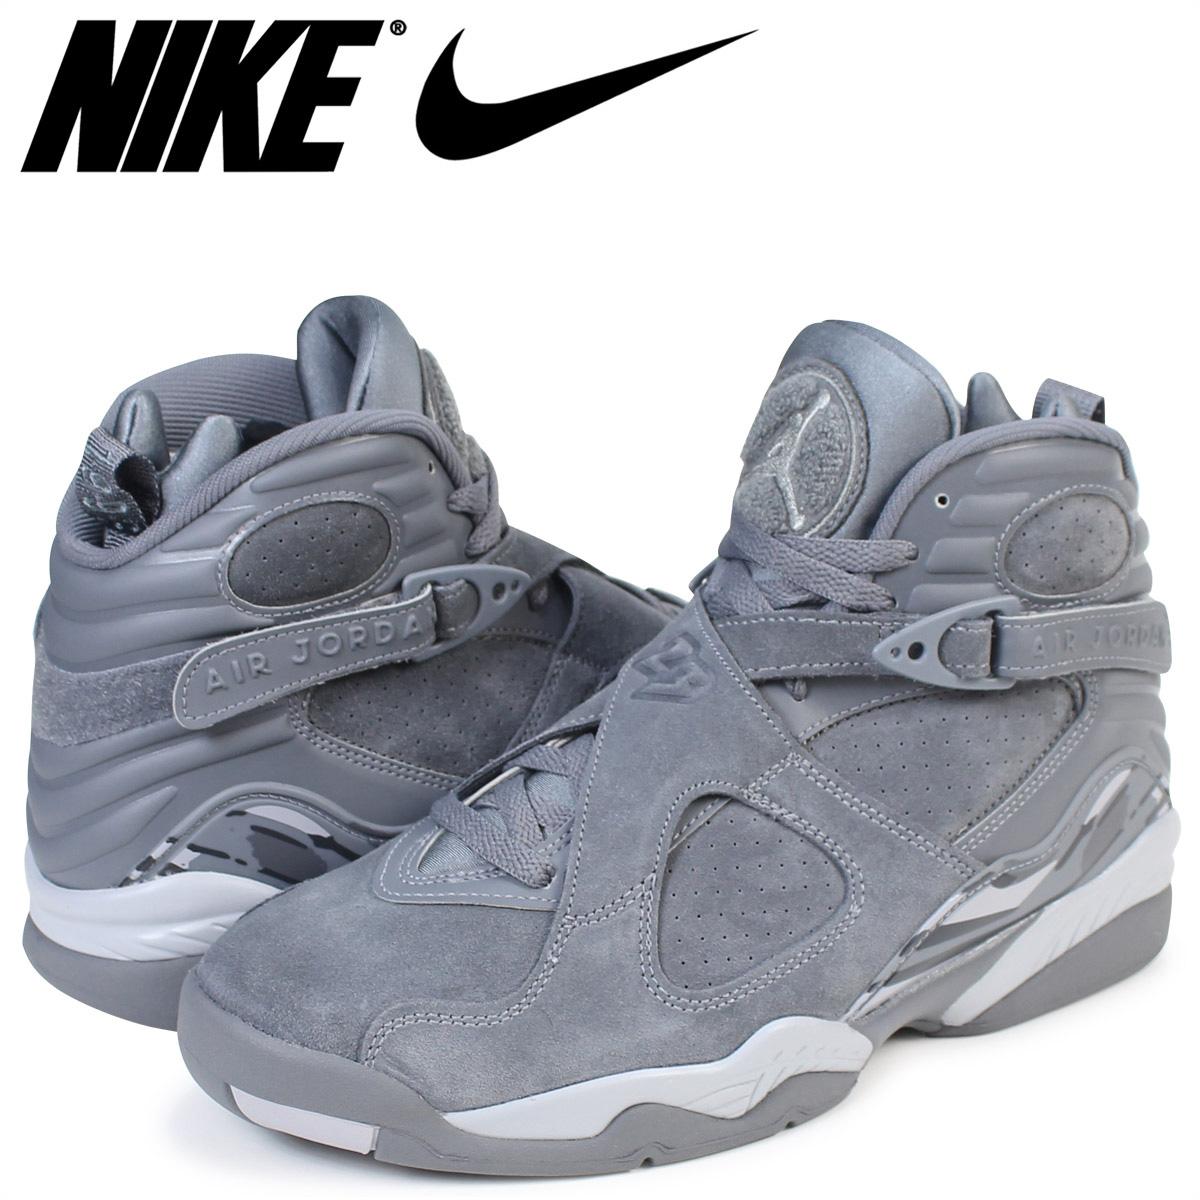 on sale a1b9d deeaf NIKE Nike Air Jordan 8 nostalgic sneakers AIR JORDAN 8 RETRO 305,381-014  men's shoes gray